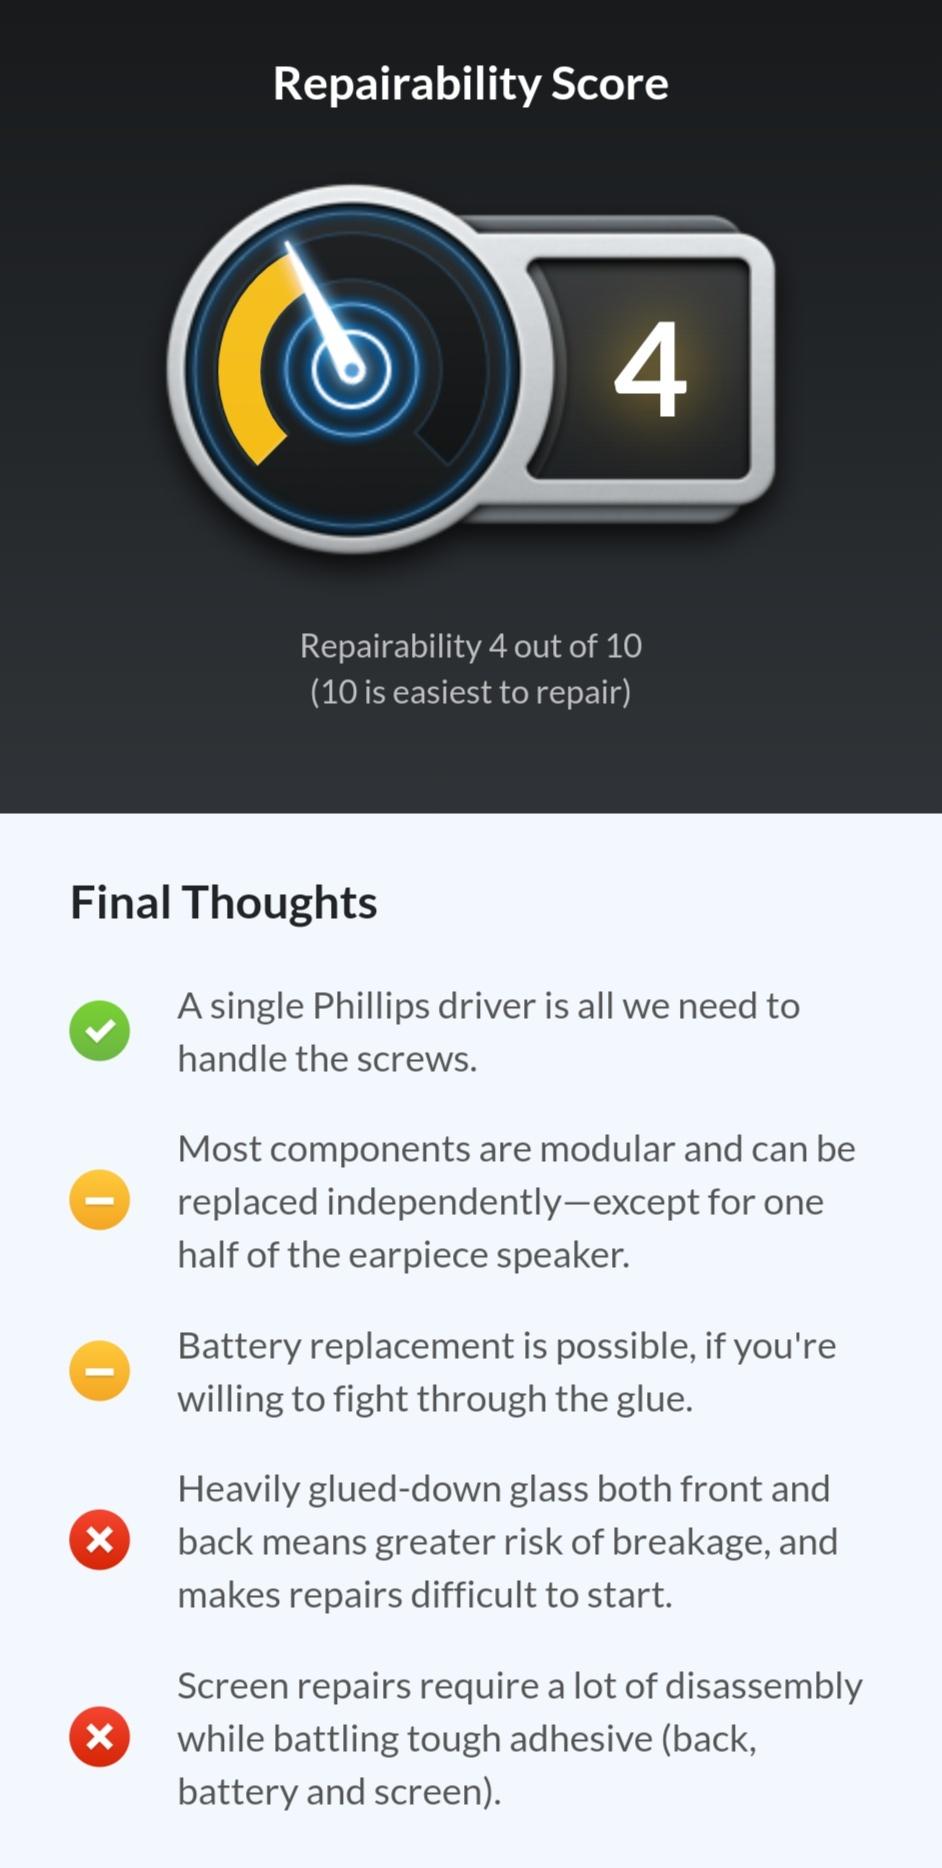 Screenshot 2019 04 14 15 33 39 655 com.android.chrome 01 - کالبدشکافی هواوی پی ۳۰ پرو و امتیاز ۴ از ۱۰ توسط iFixit